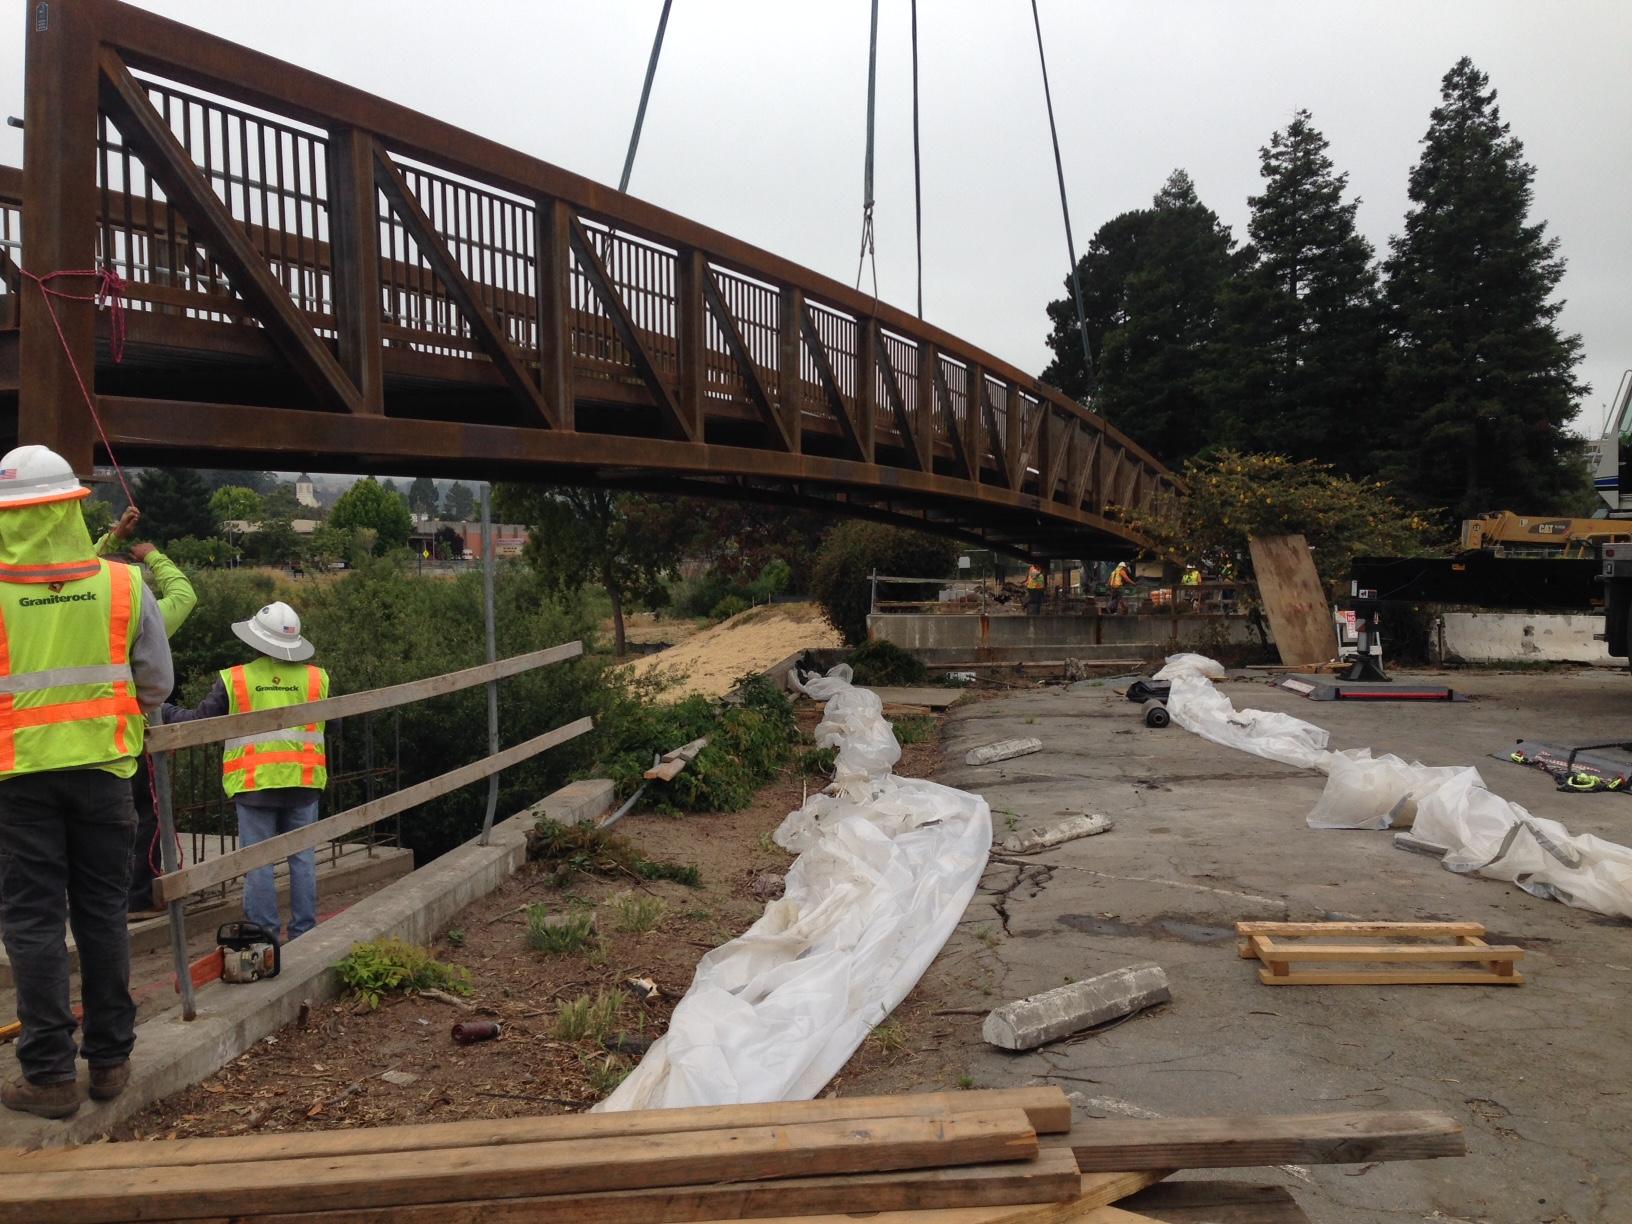 New bridge for Santa Cruz